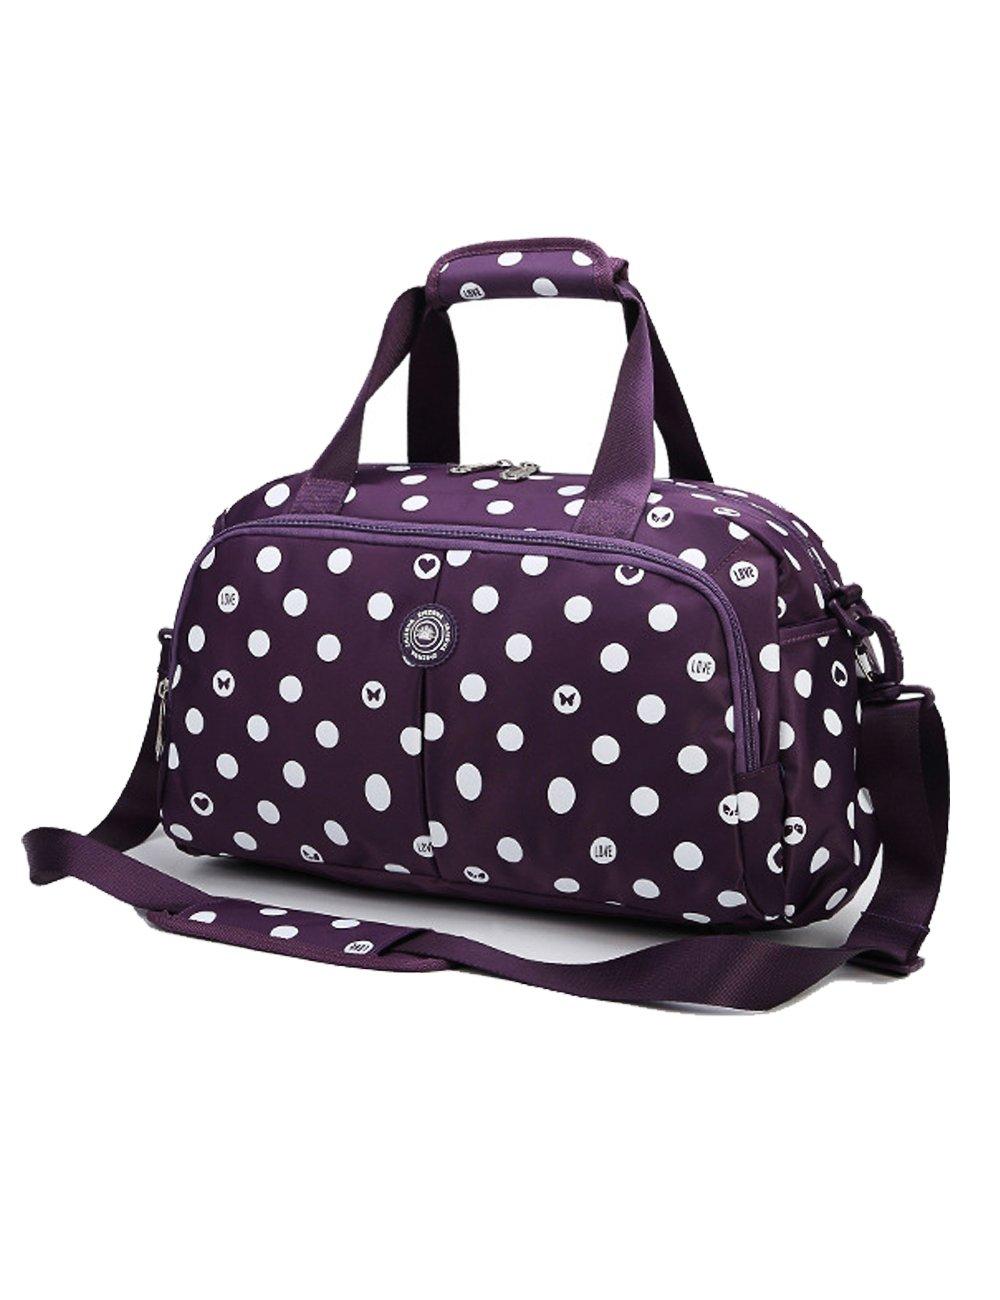 Amazon.com   Small Gym Duffle Bag for Women Girls (Small, Brown)   Sports  Duffels e63a9d48c5